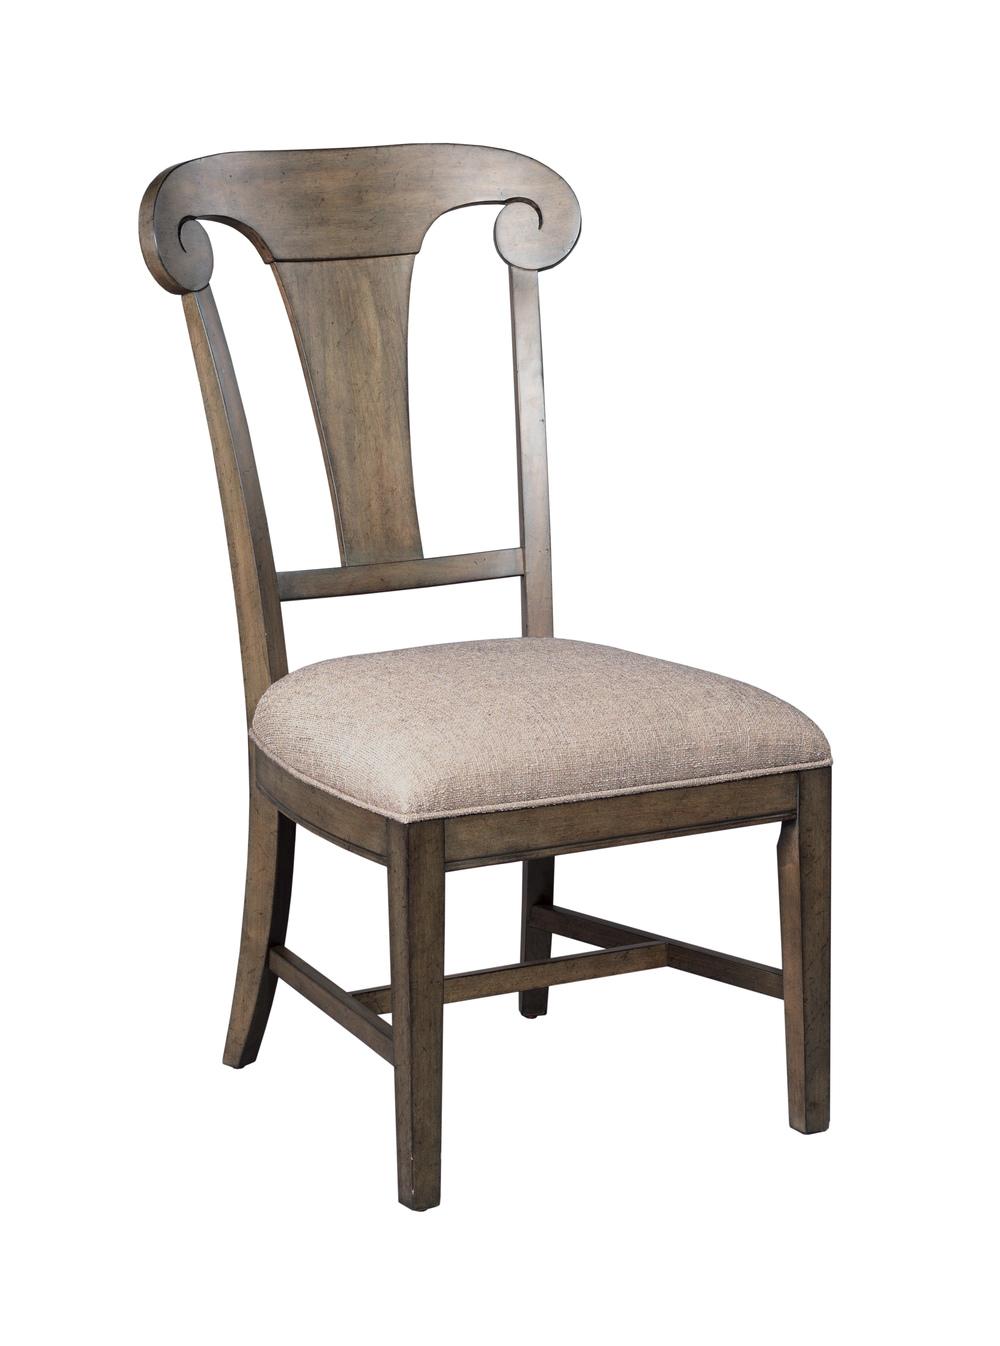 Kincaid Furniture - Fulton Splat Back Side Chair